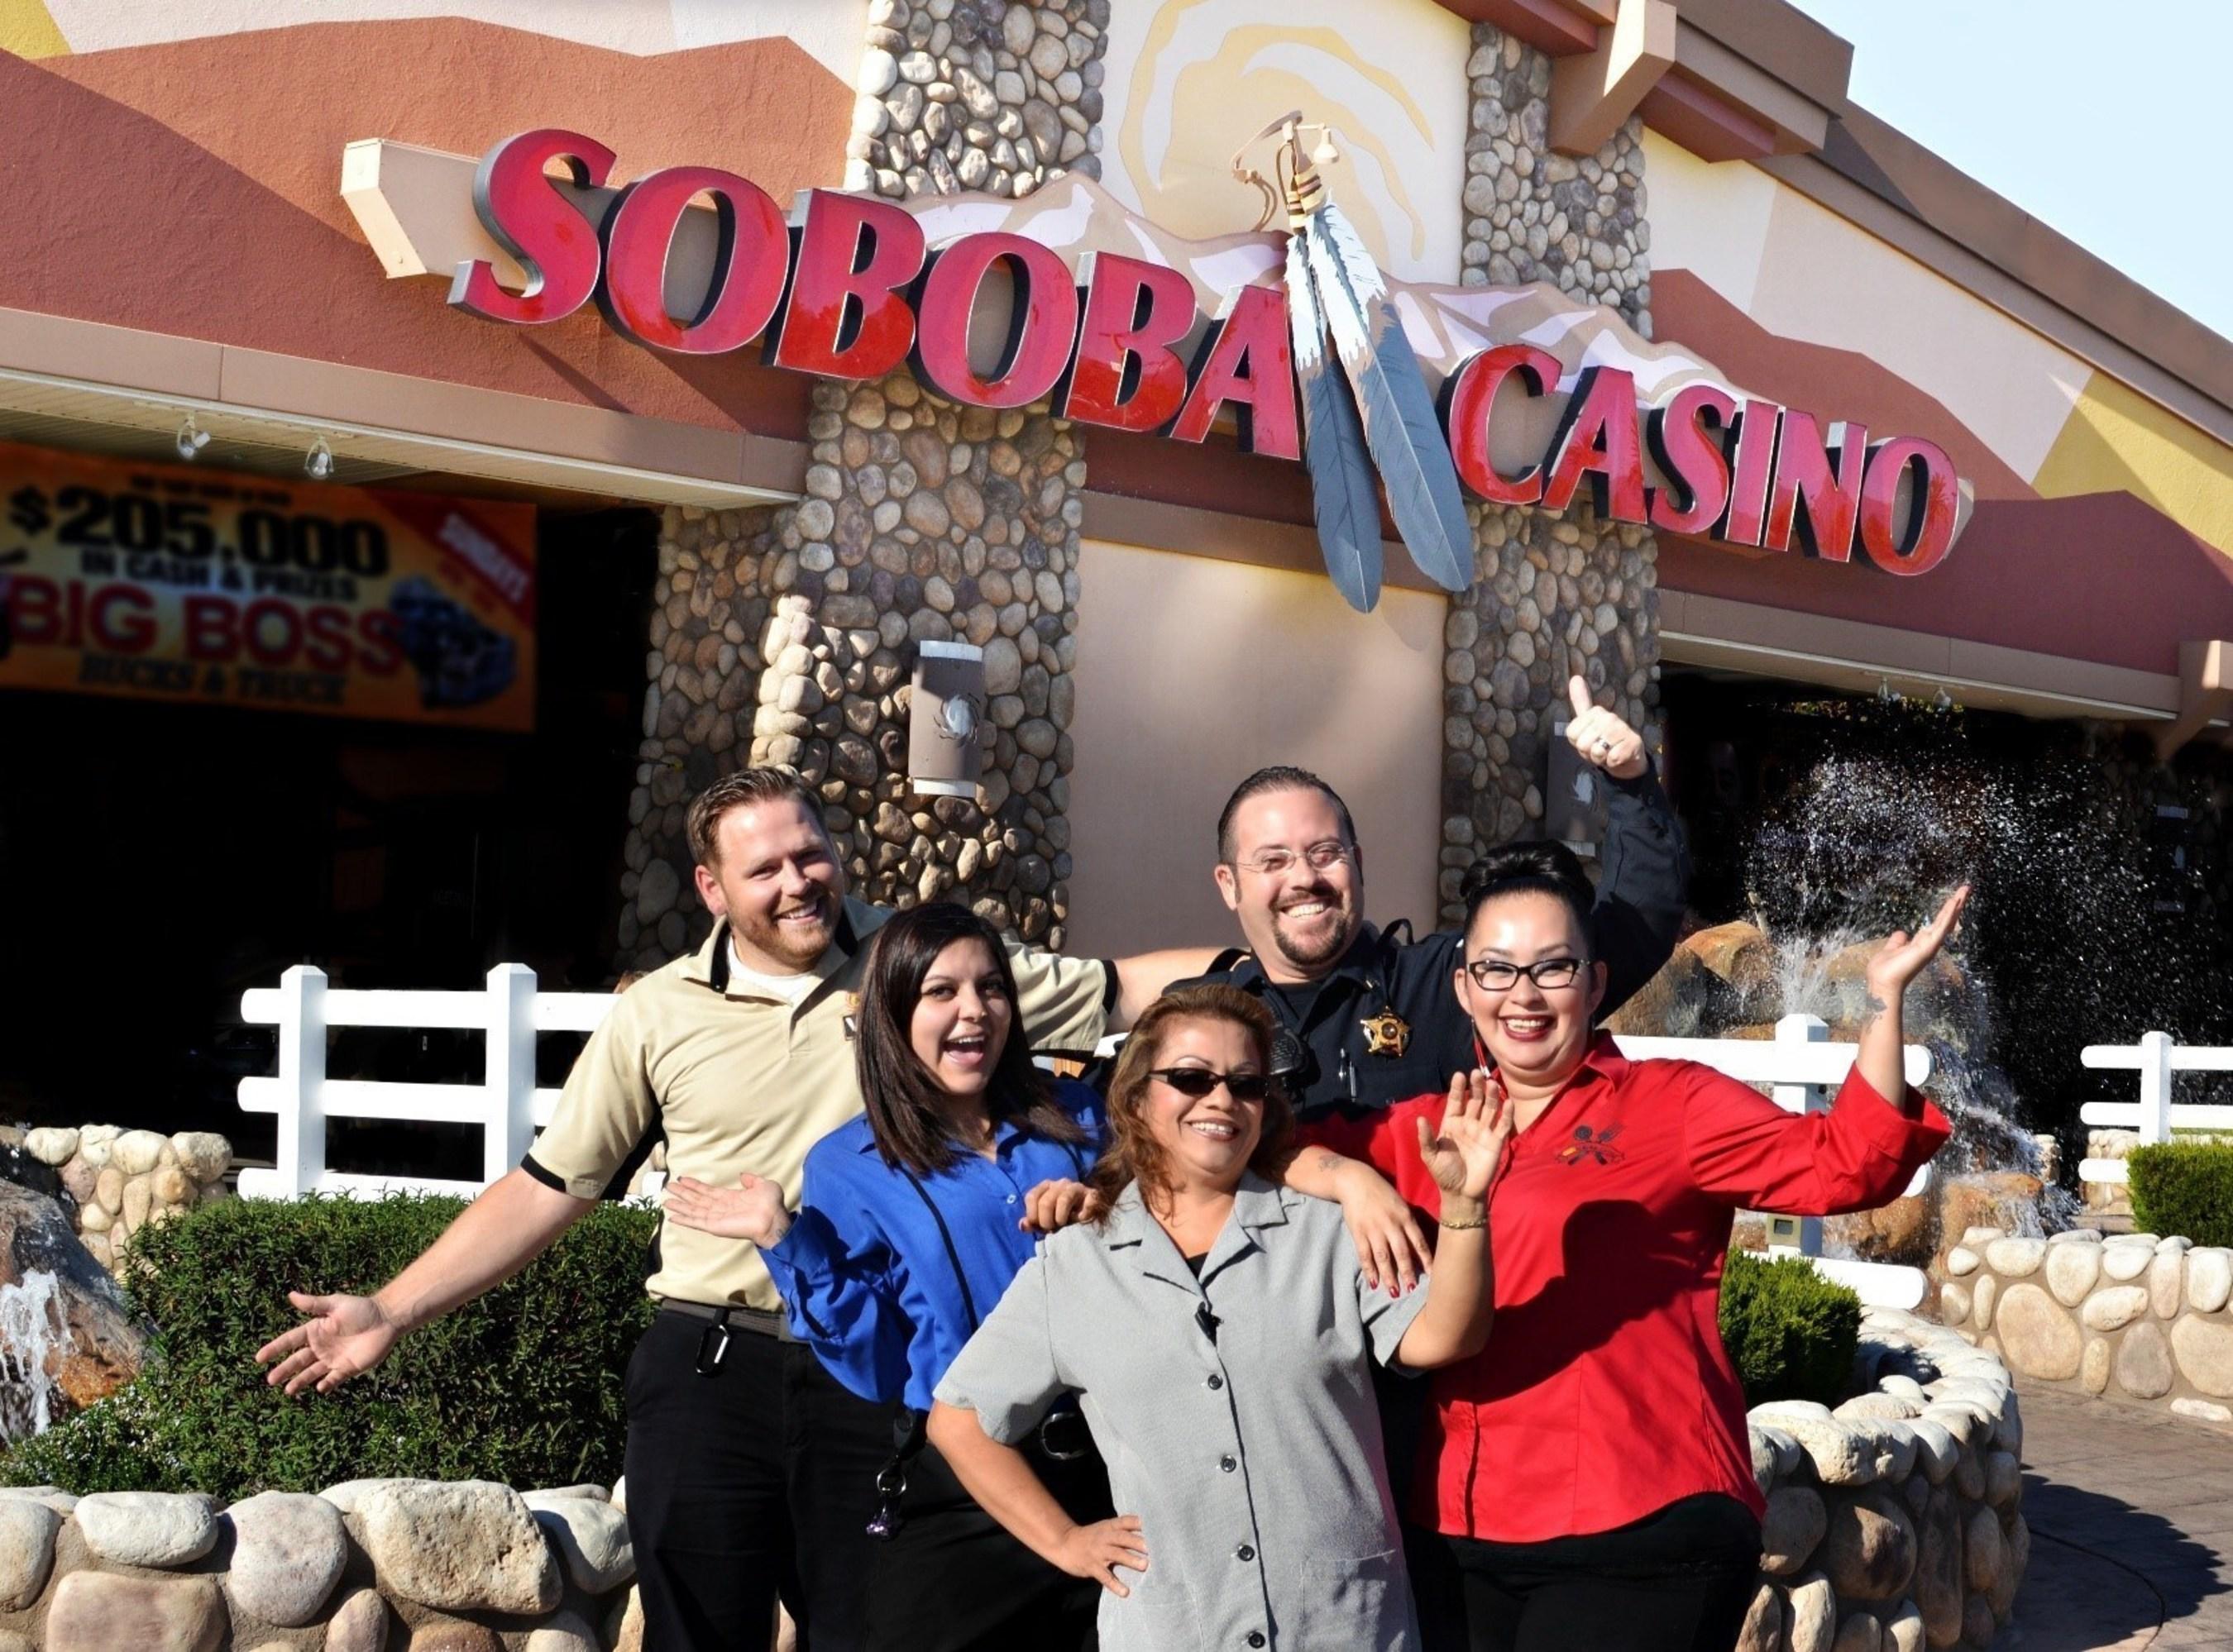 Soboba casino jobs housekeeping